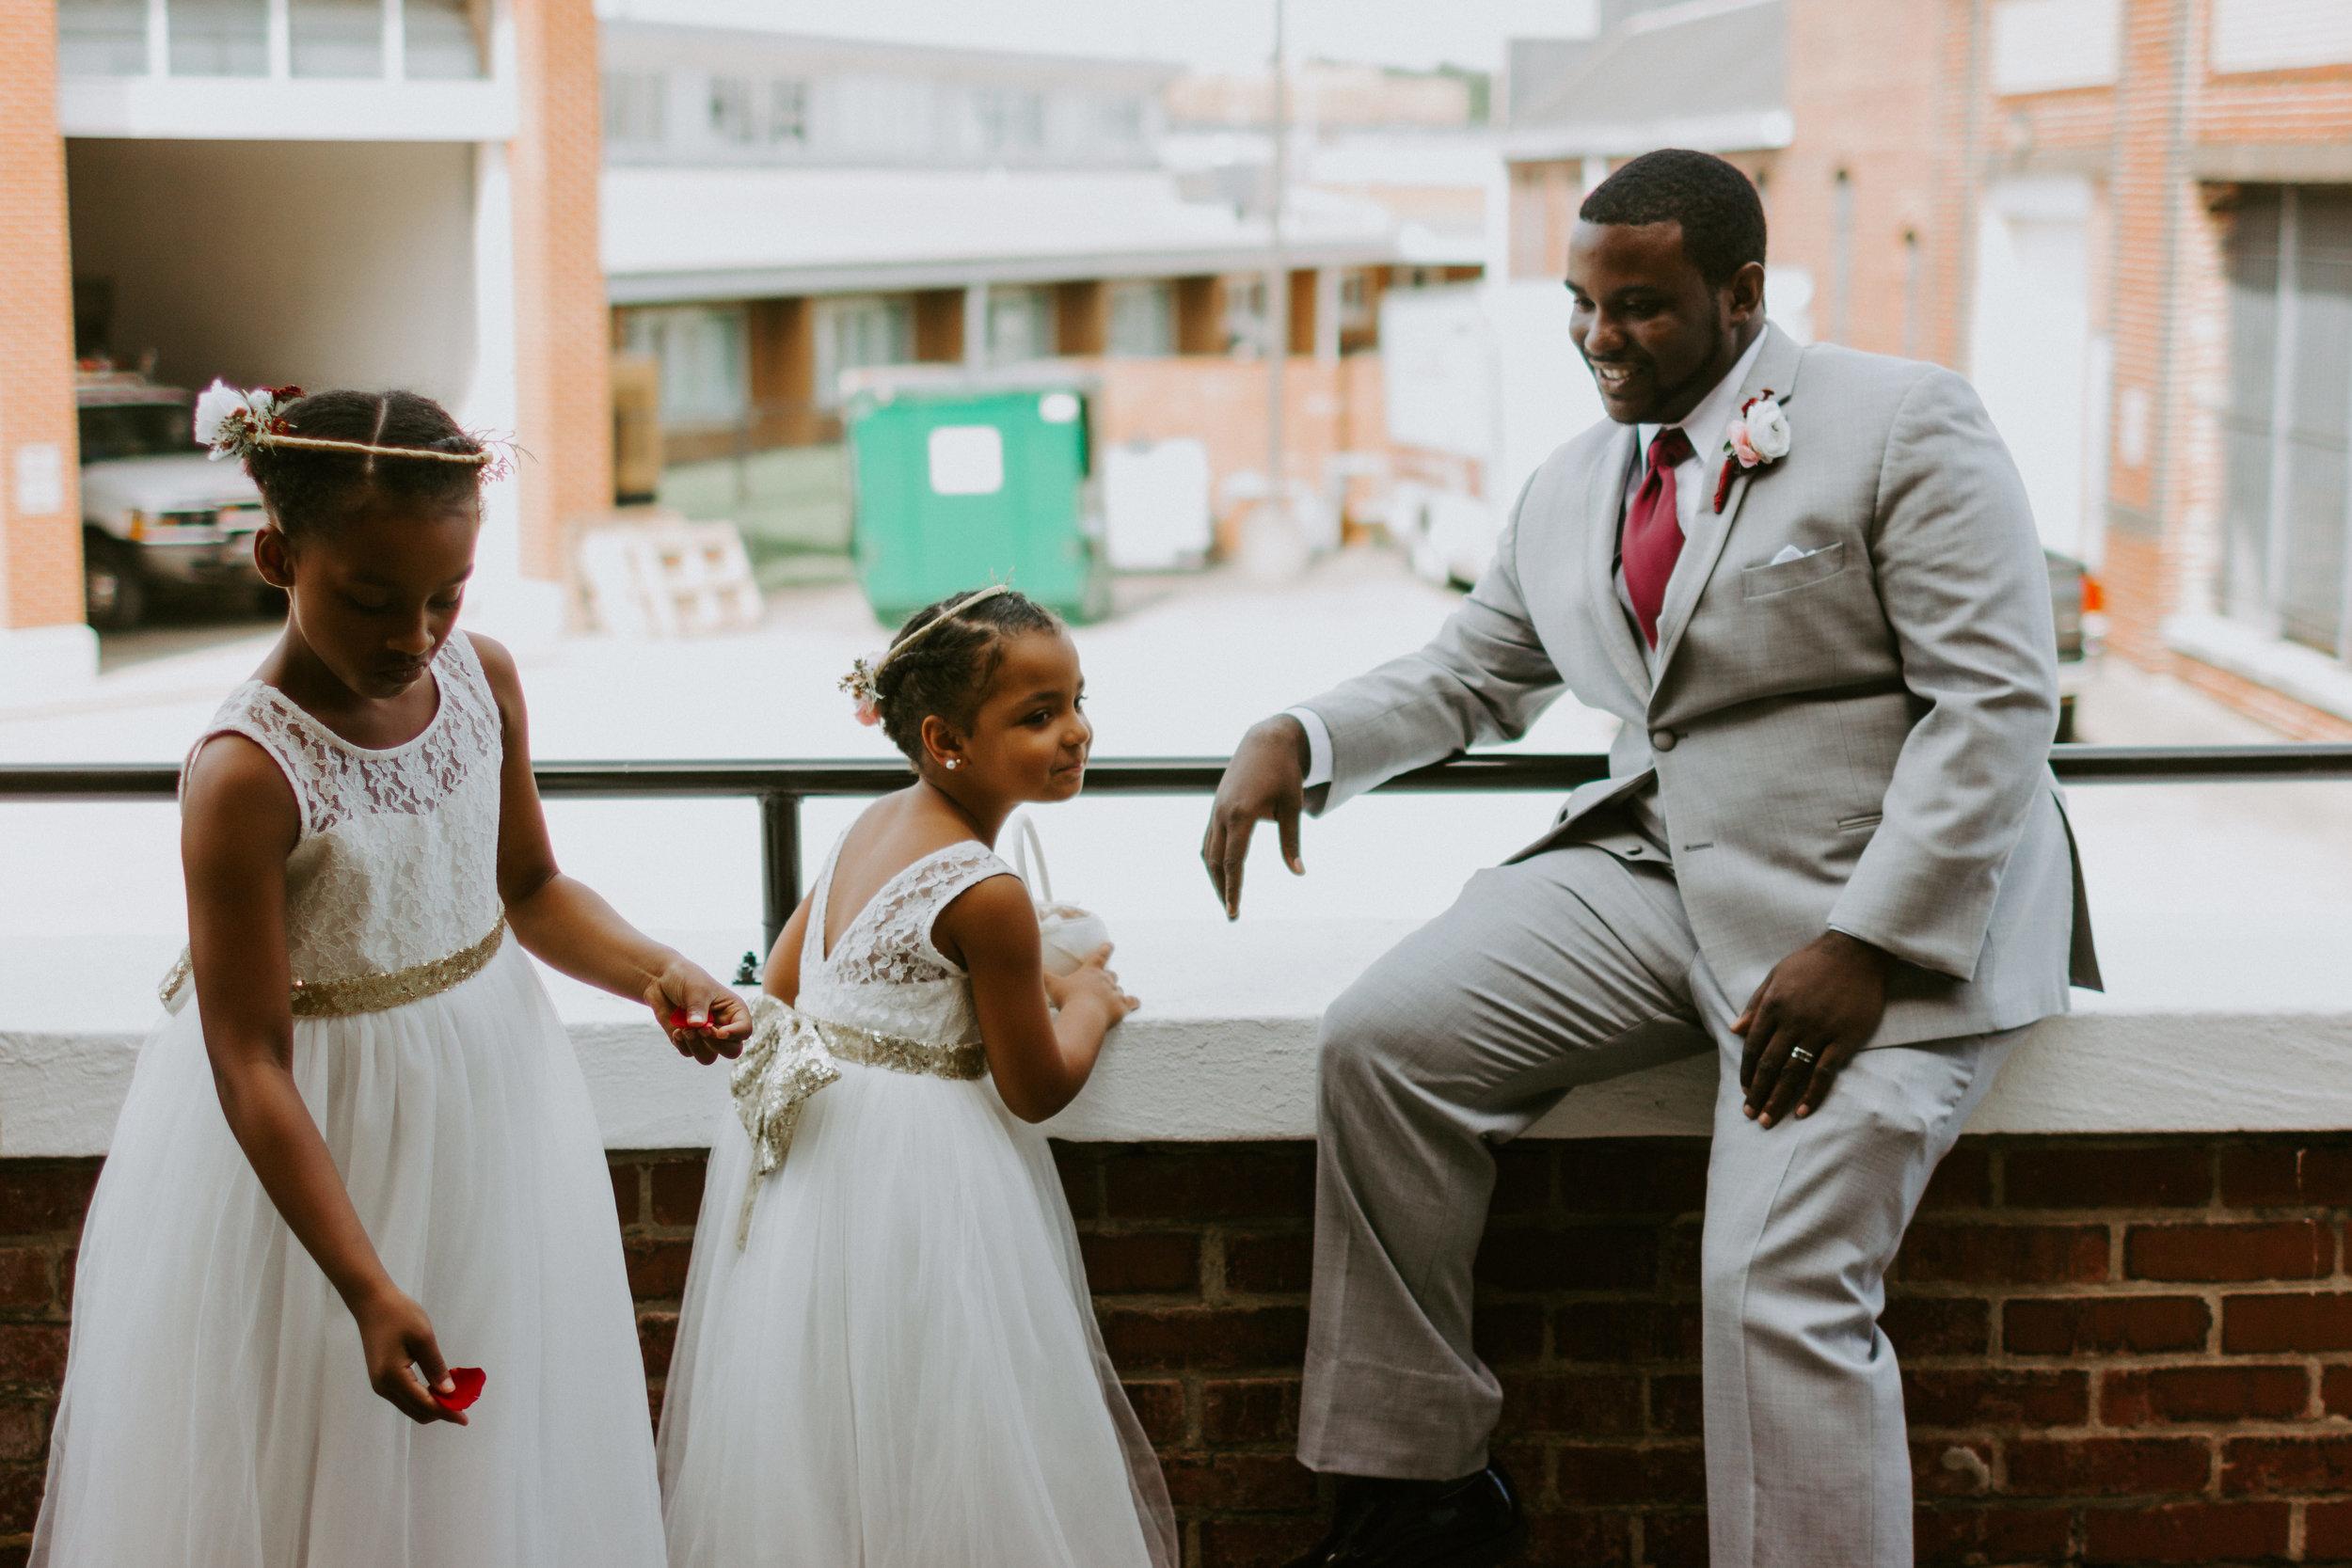 WonderlyCreative_Wedding_6.7.18_Khara&Dwayne_-576.jpg